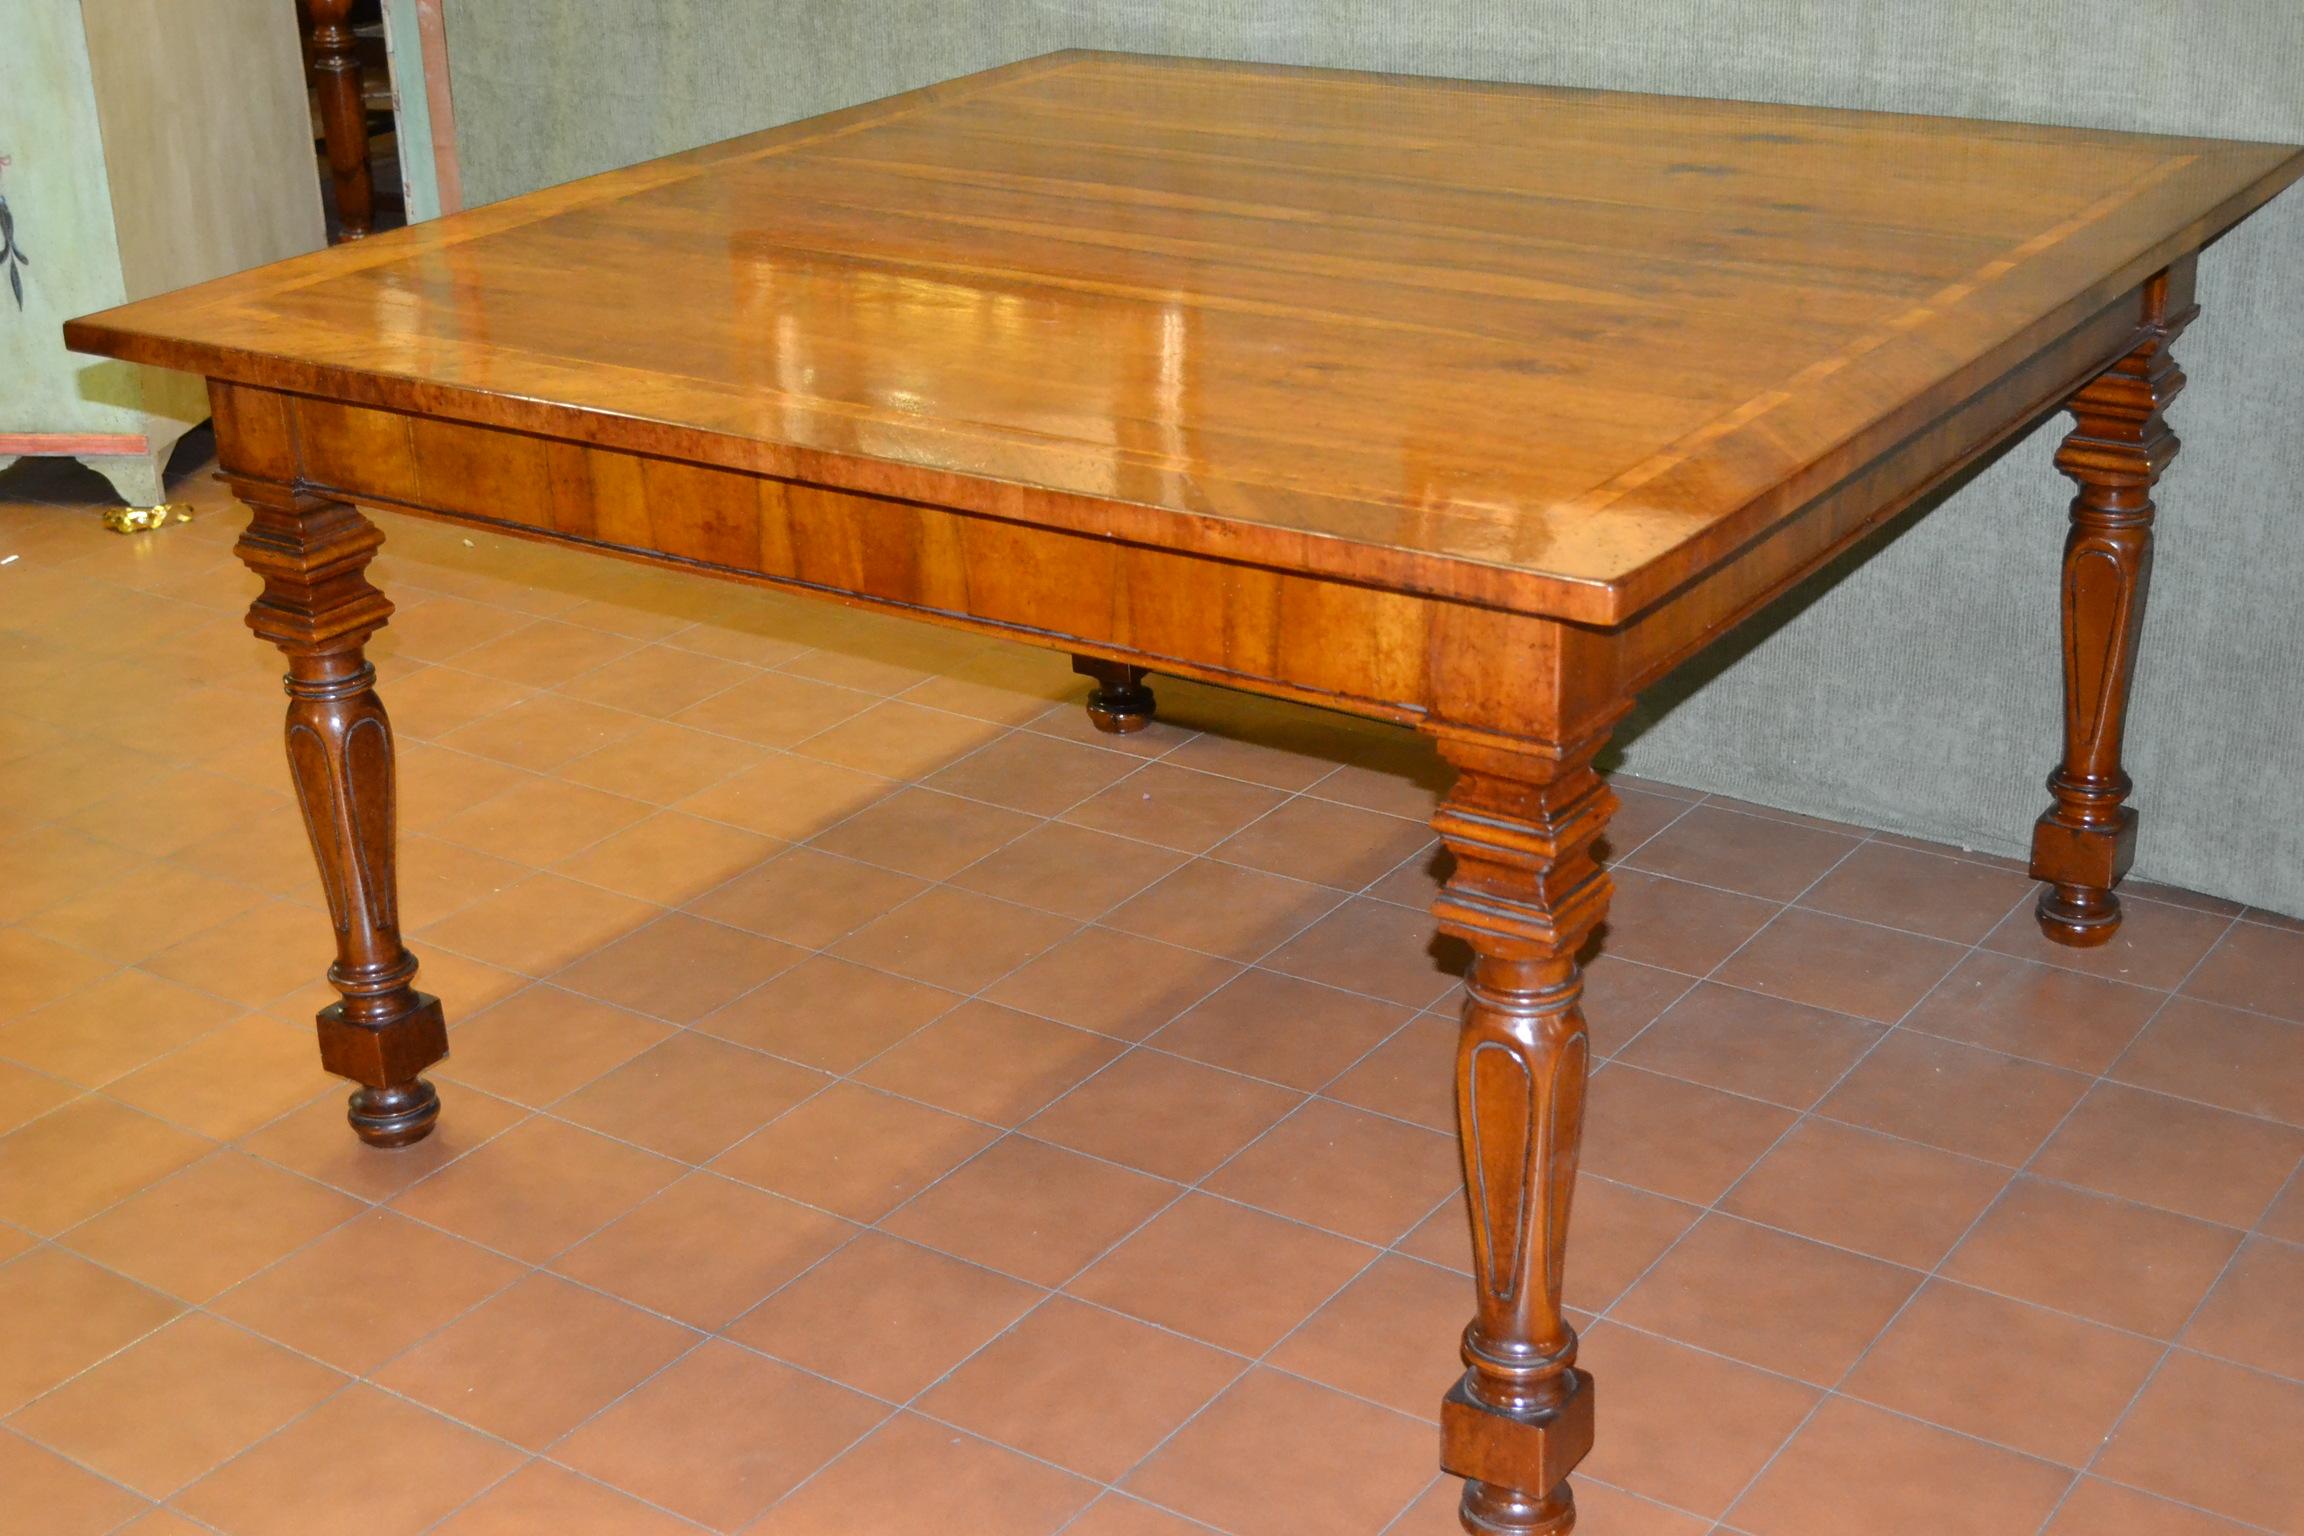 Tavolo luigi xvi in legno antico livio bernardi mobili mobili d 39 arte artigianali in legno - Mobili luigi xvi prezzi ...